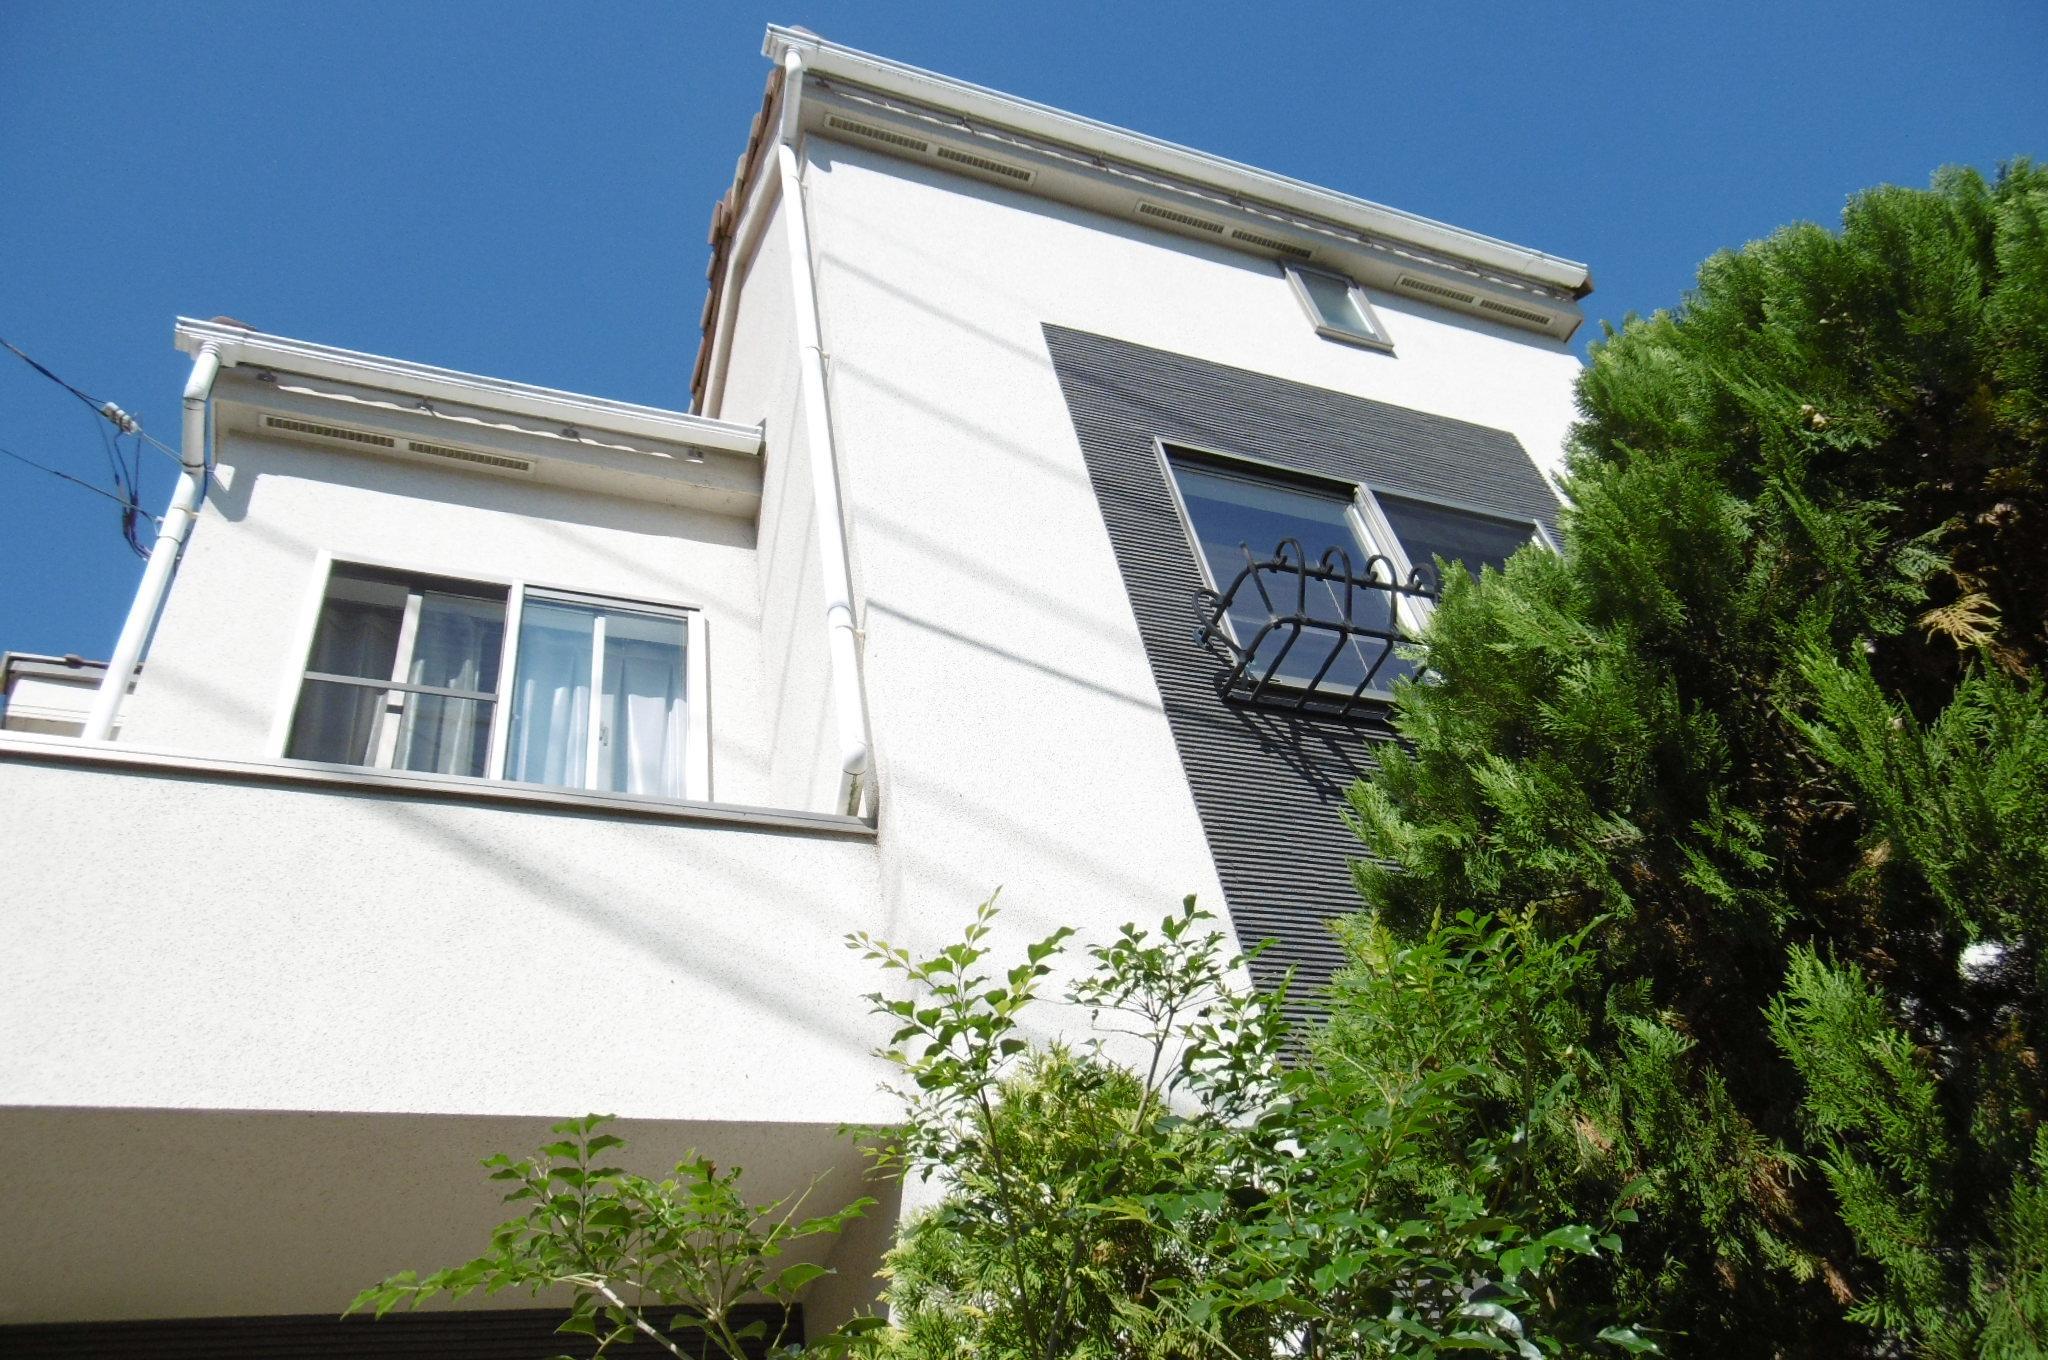 3ldk house yotsuya fuchu shi tokyo japan for for Japan homes for sale